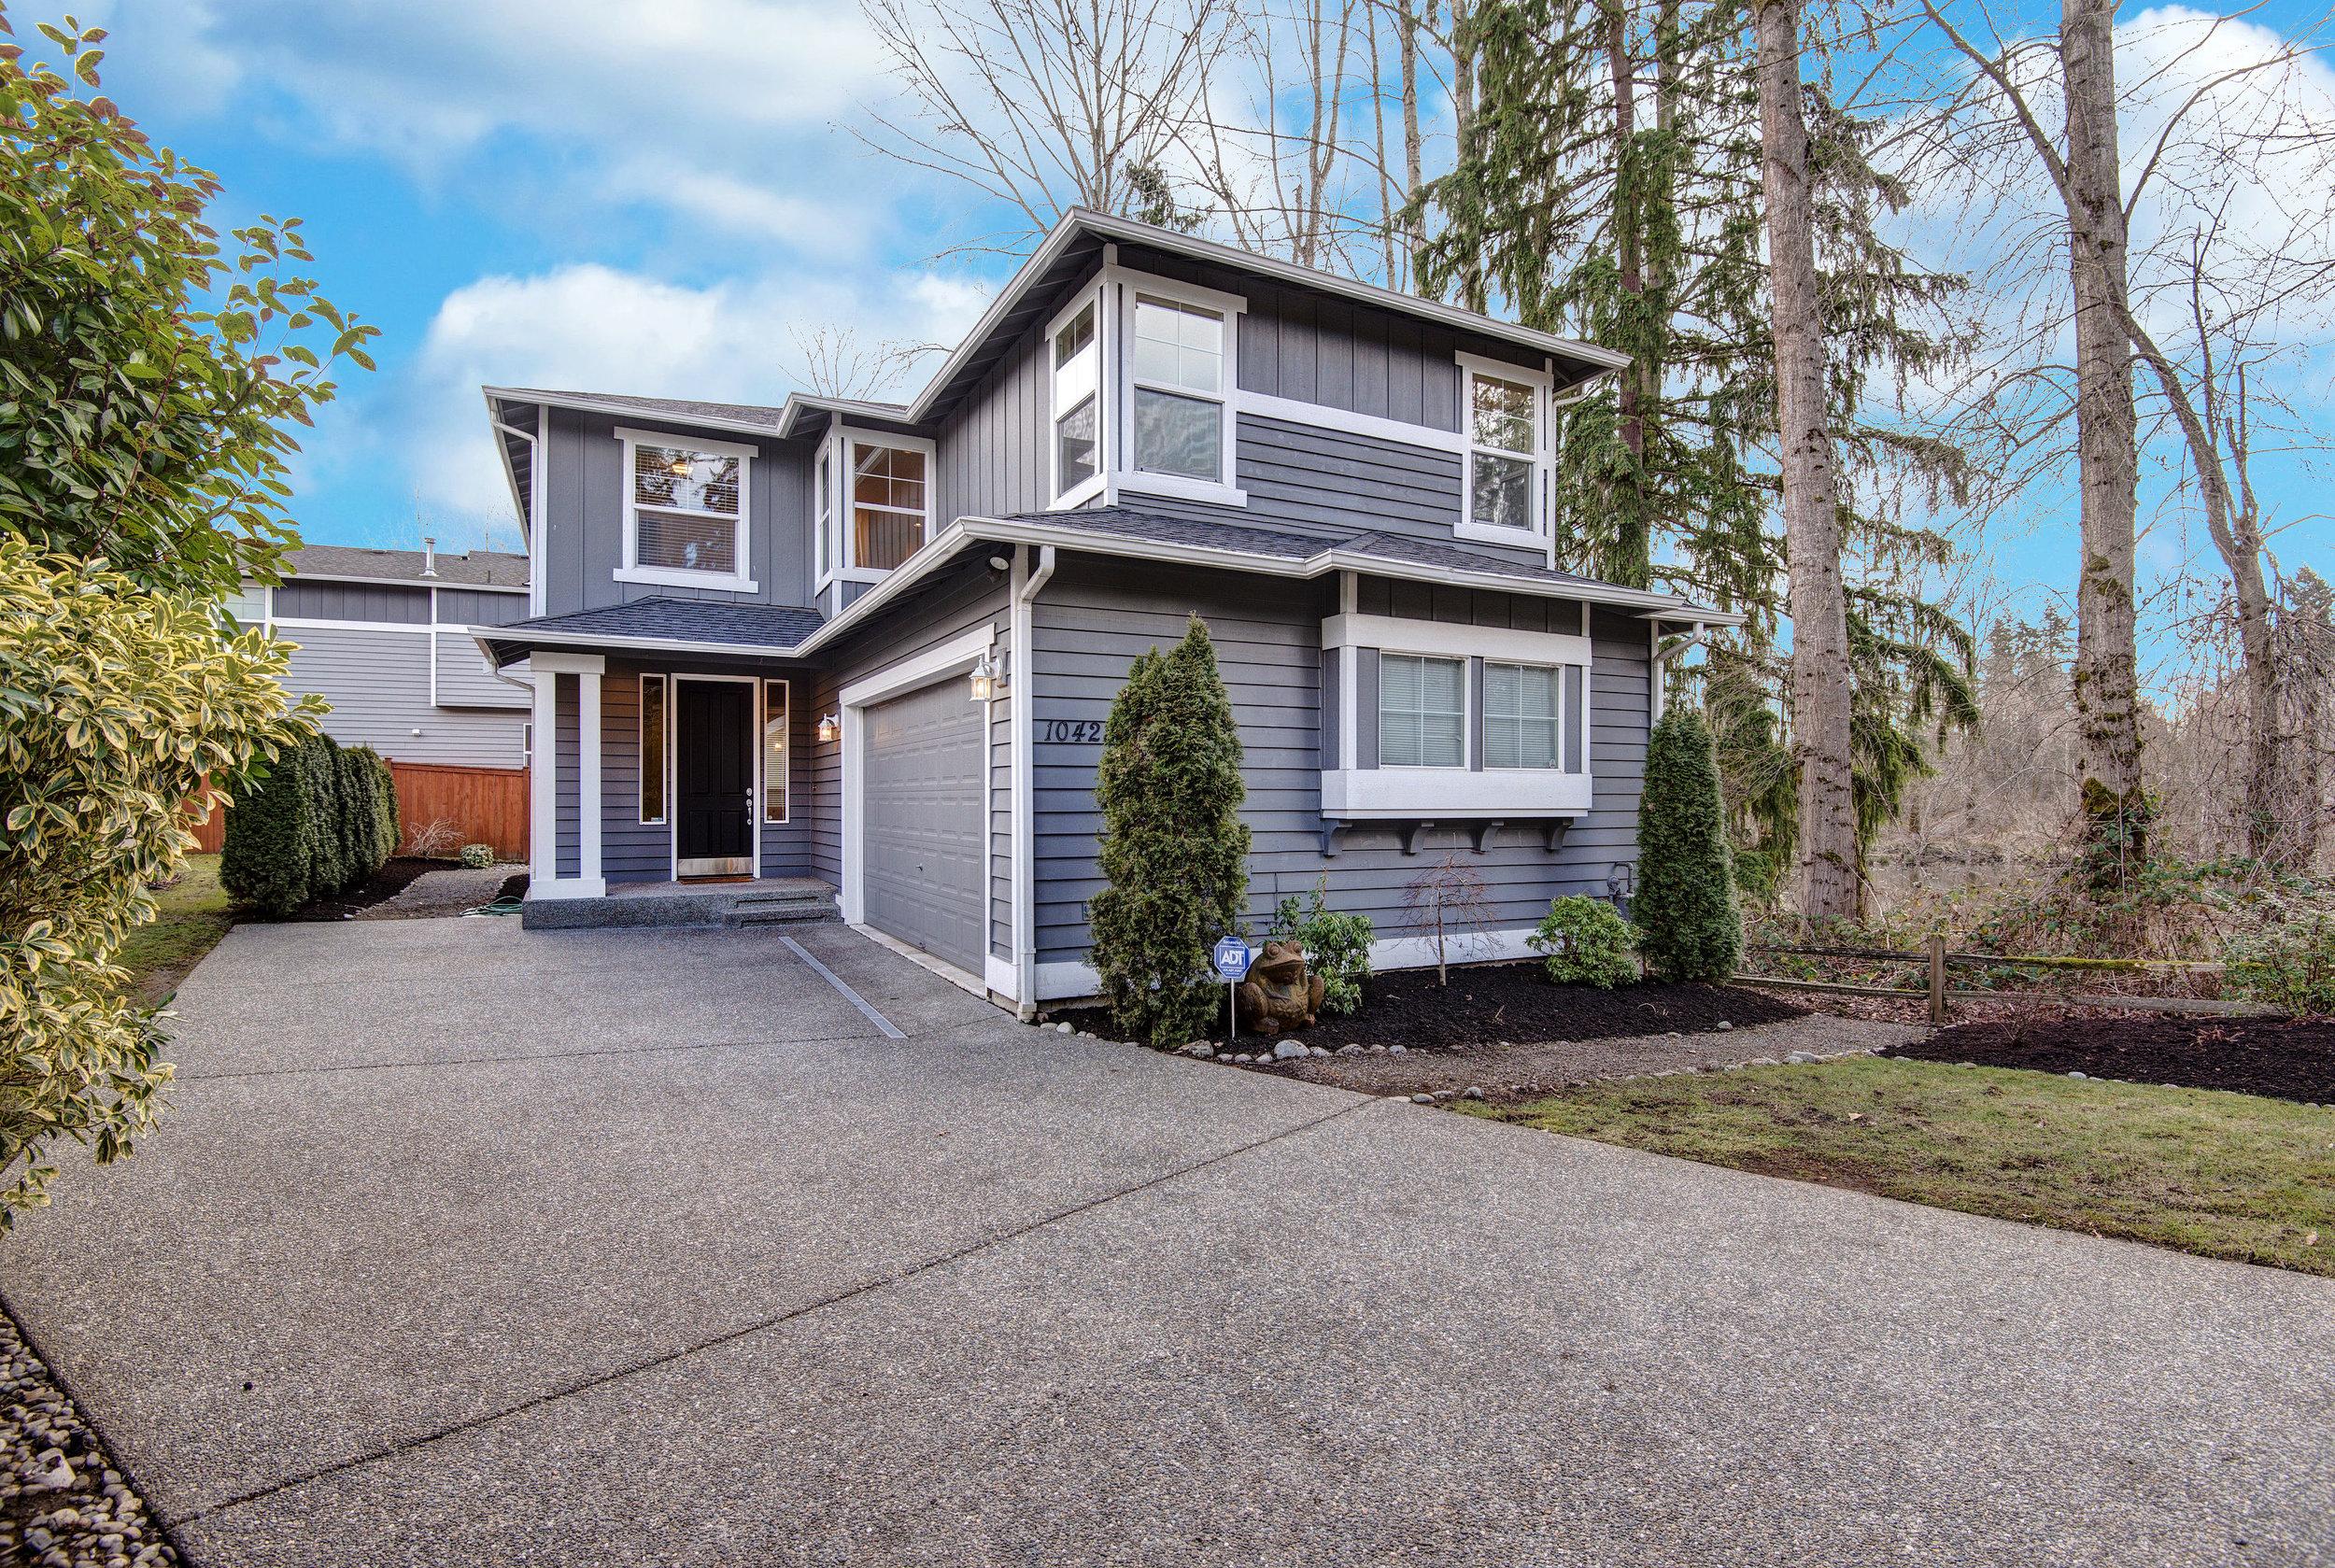 Kirkland, WA | Sold for $749,000